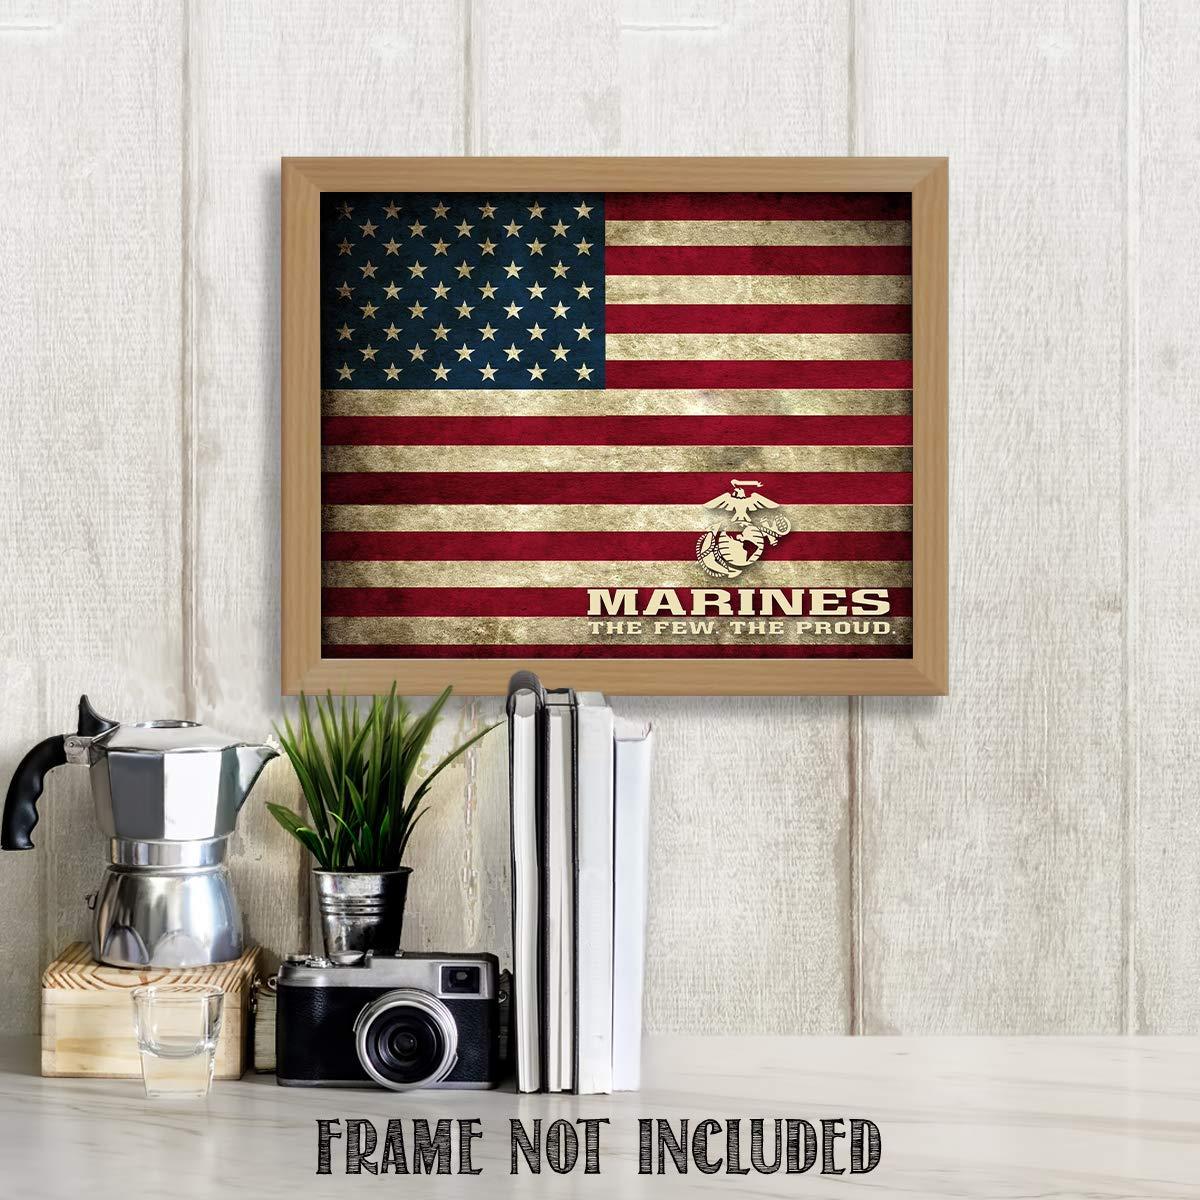 Amazon Com Marines The Few The Proud 10 X 8 Wall Art Print